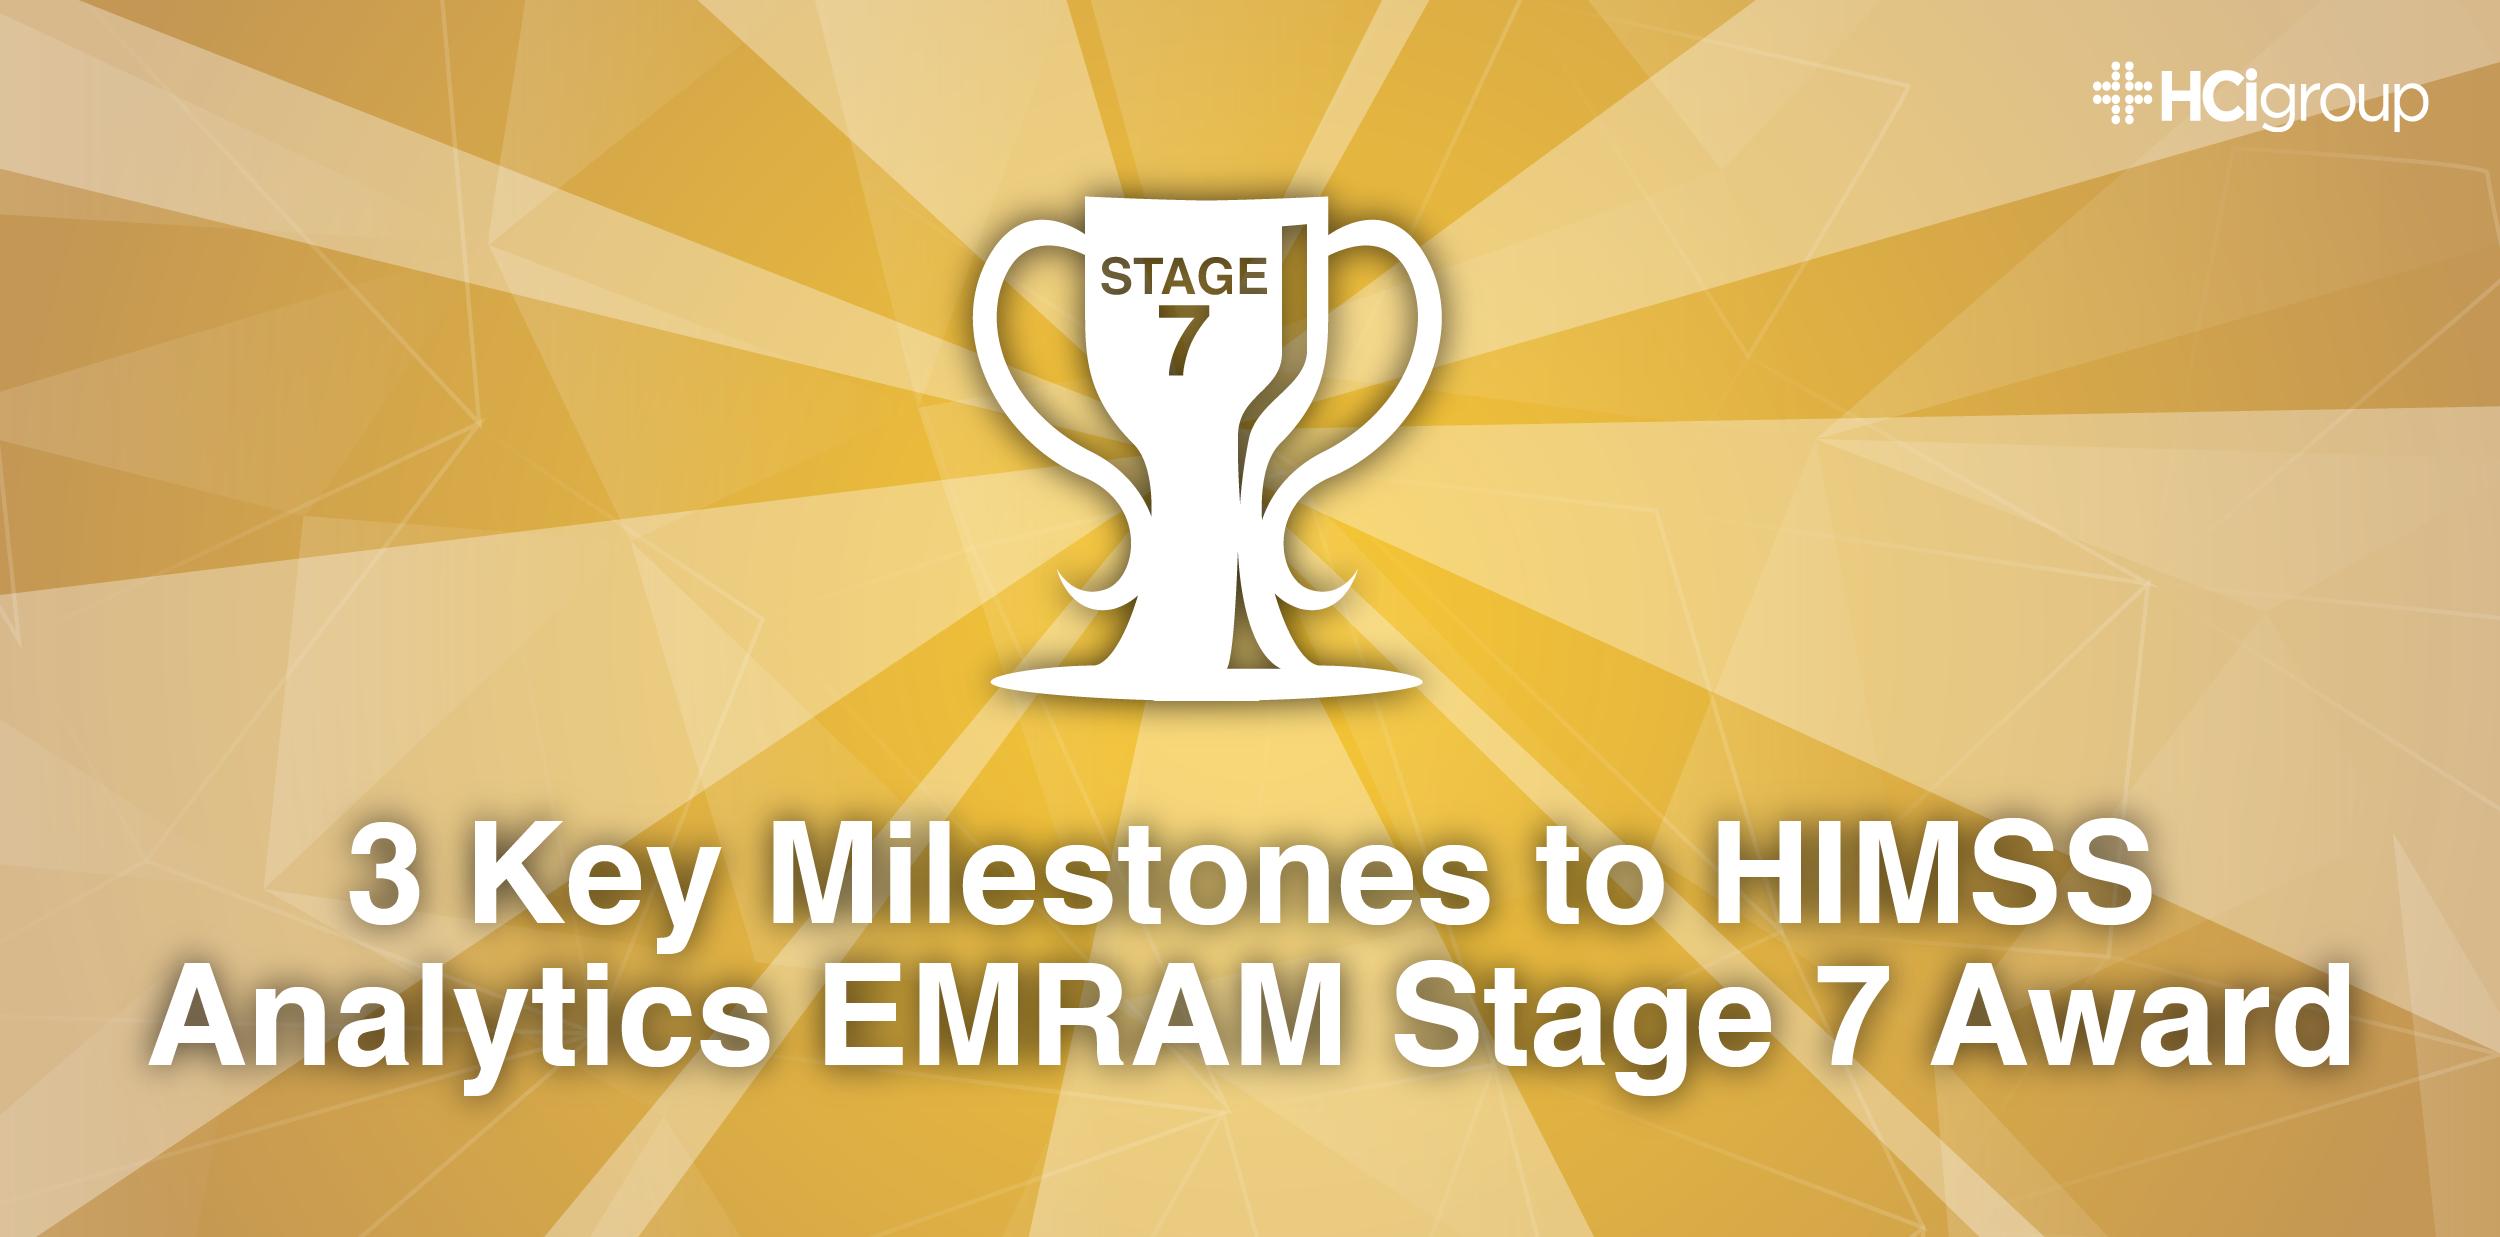 3 Key Milestones to HIMSS Analytics EMRAM Stage 7 Award